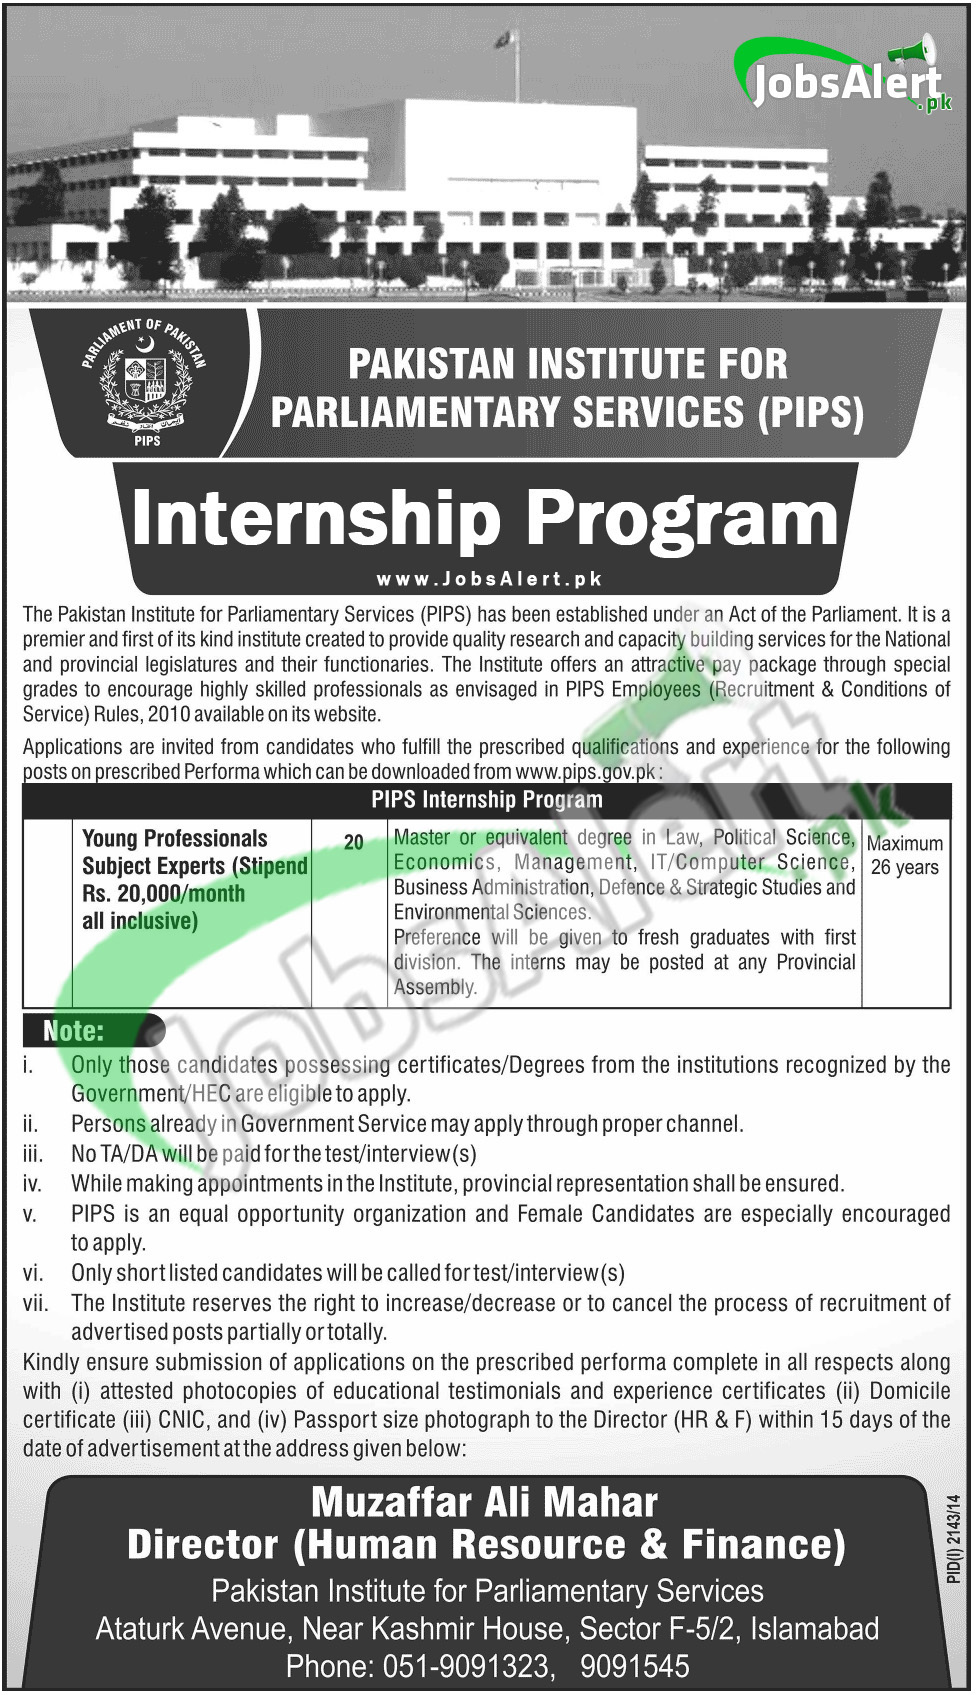 PIPS Internship Program 2014 (Pakistan Institute for Parliamentary Services)